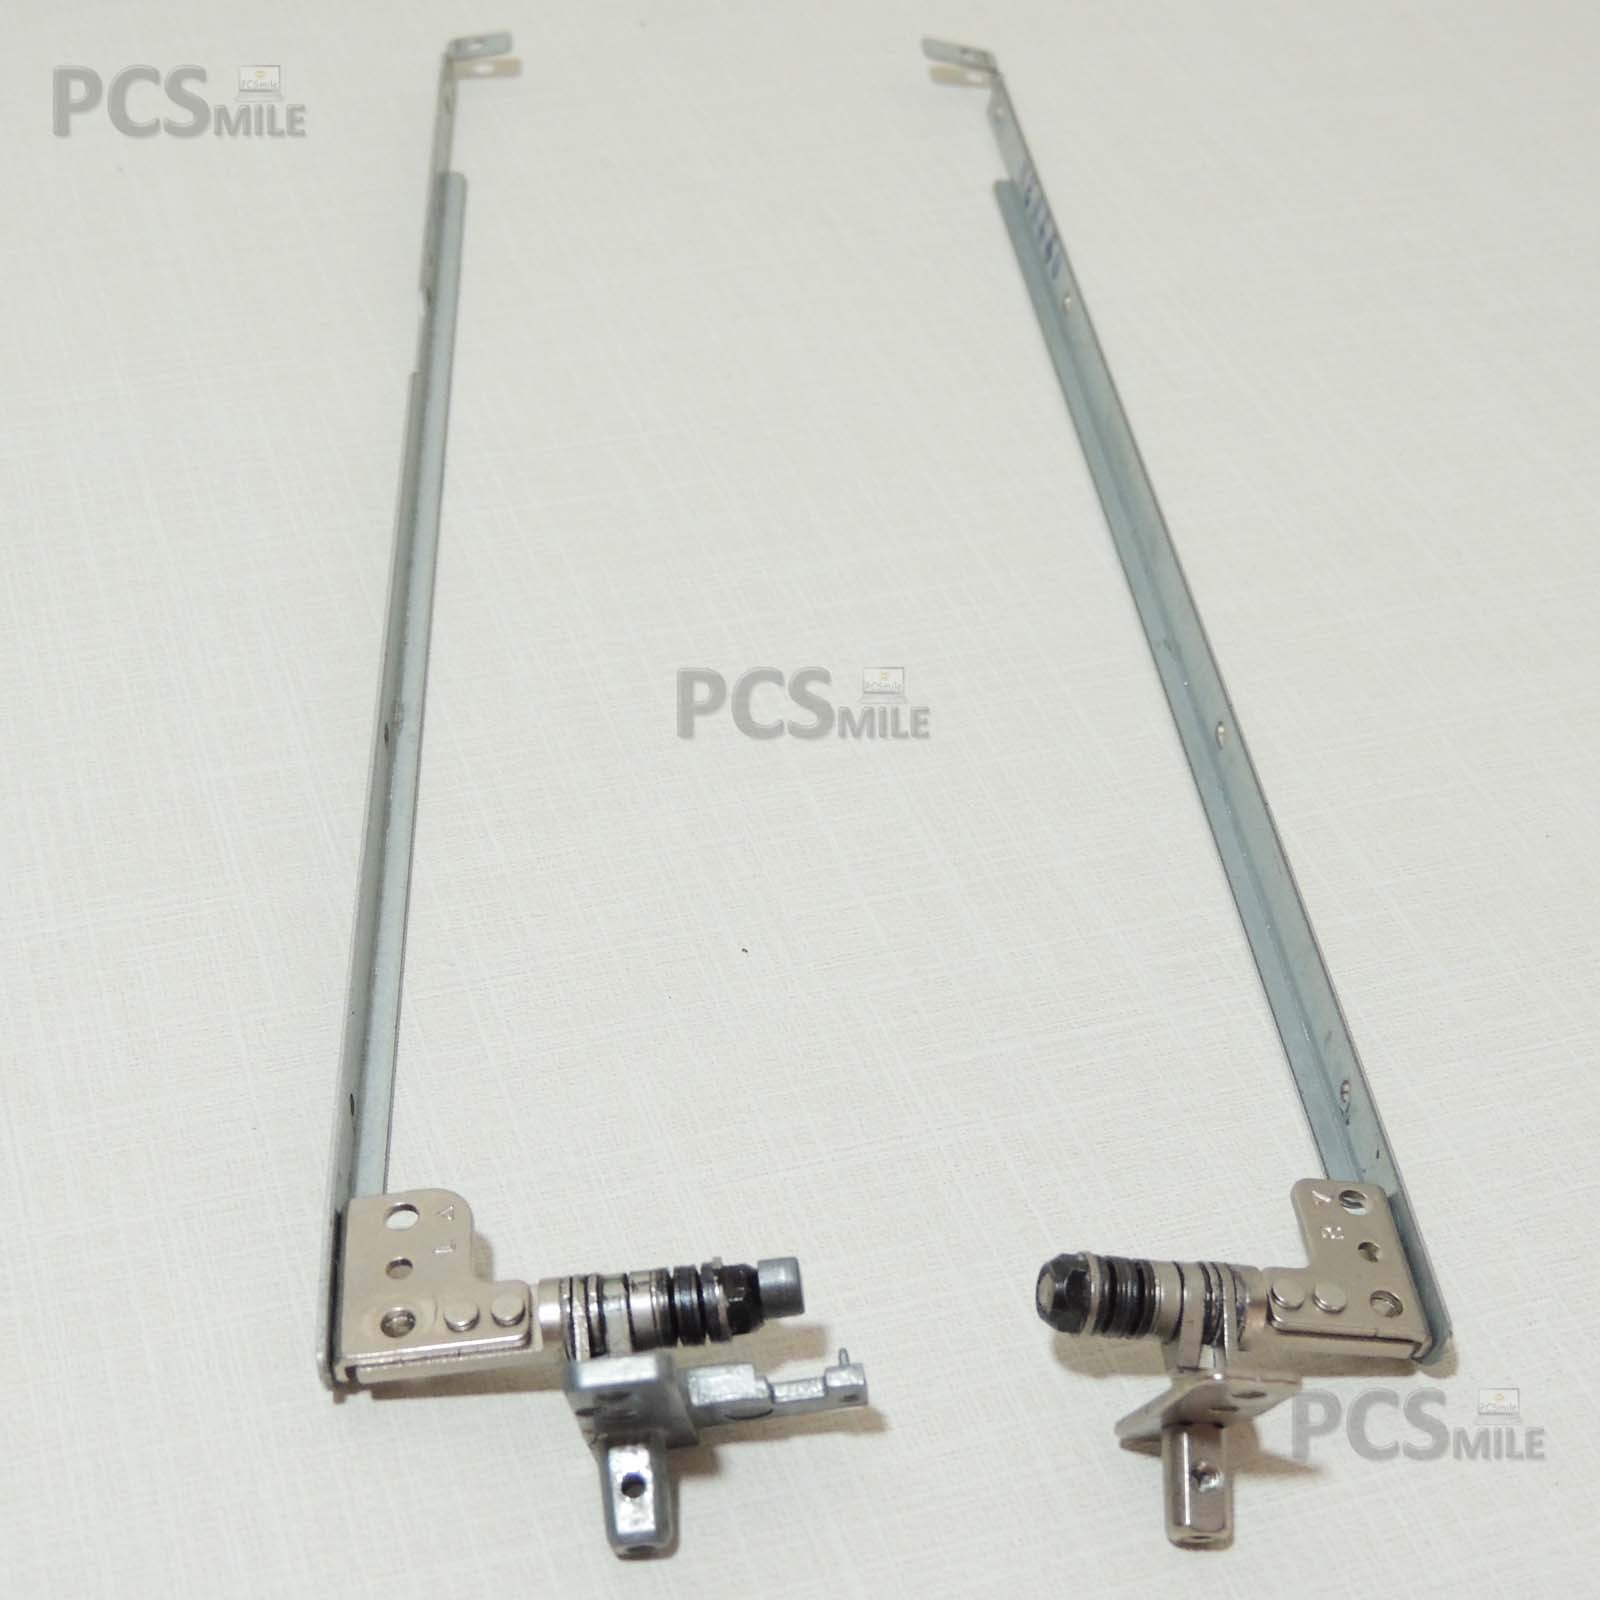 Cerniere display Fujitsu Esprimo Mobile V6555 Z17M 6055B0004702-R/L (CJC) A01